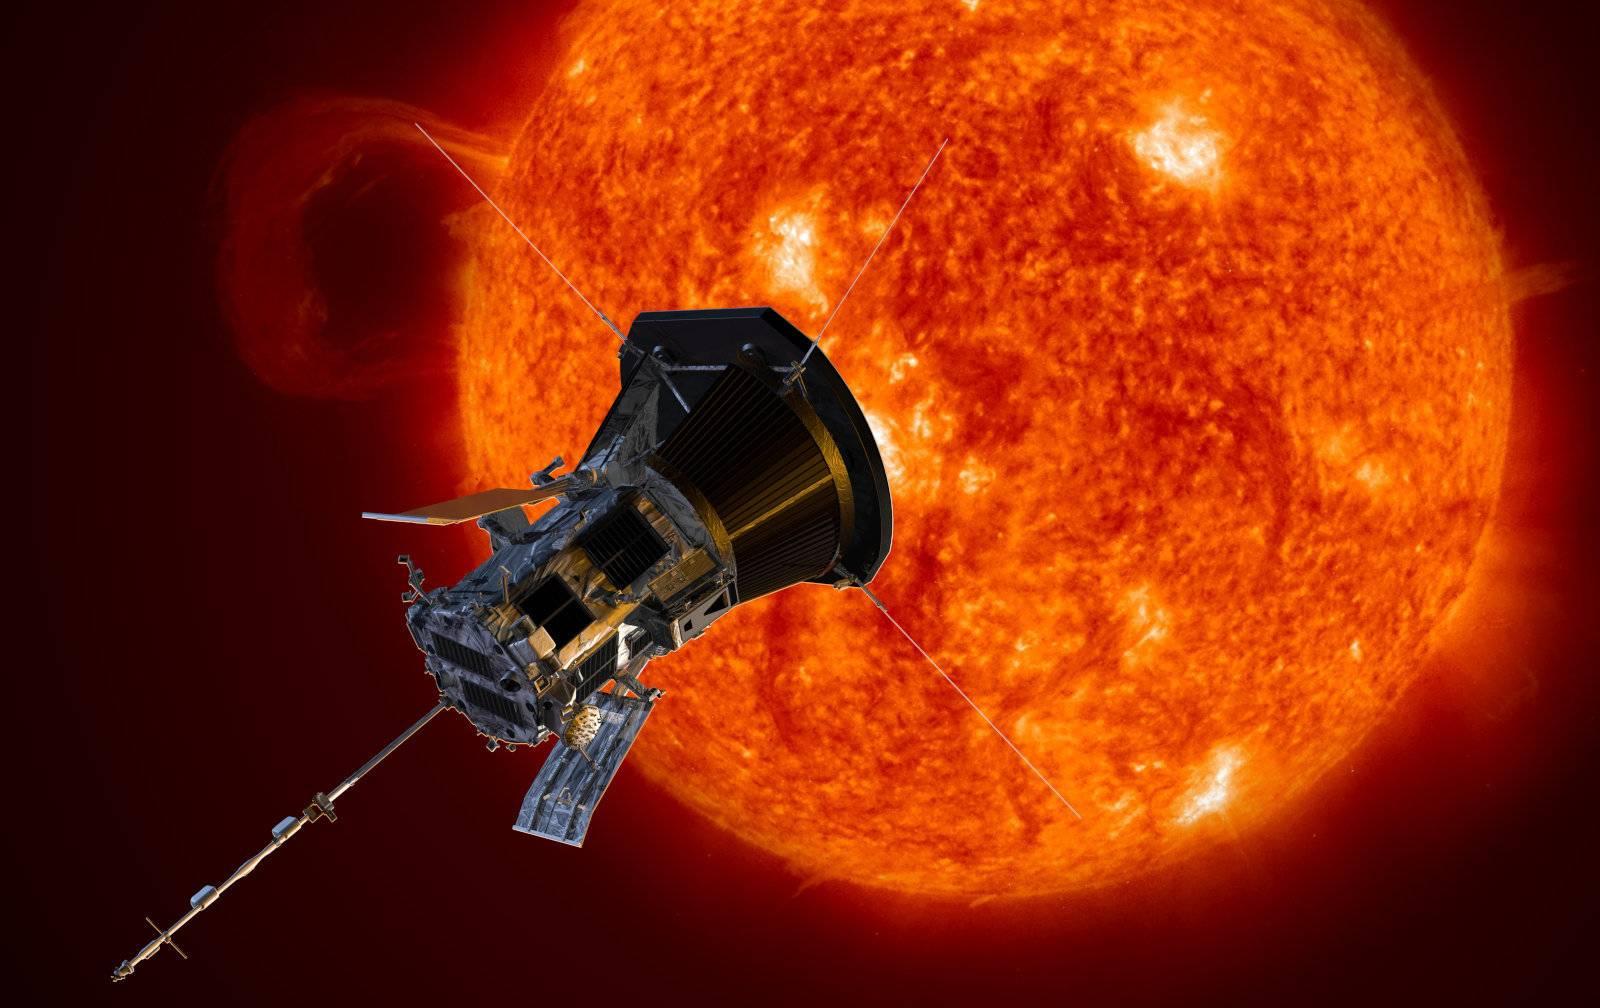 Soarele are Primele SECRETE Dezvaluite de o Sonda a NASA